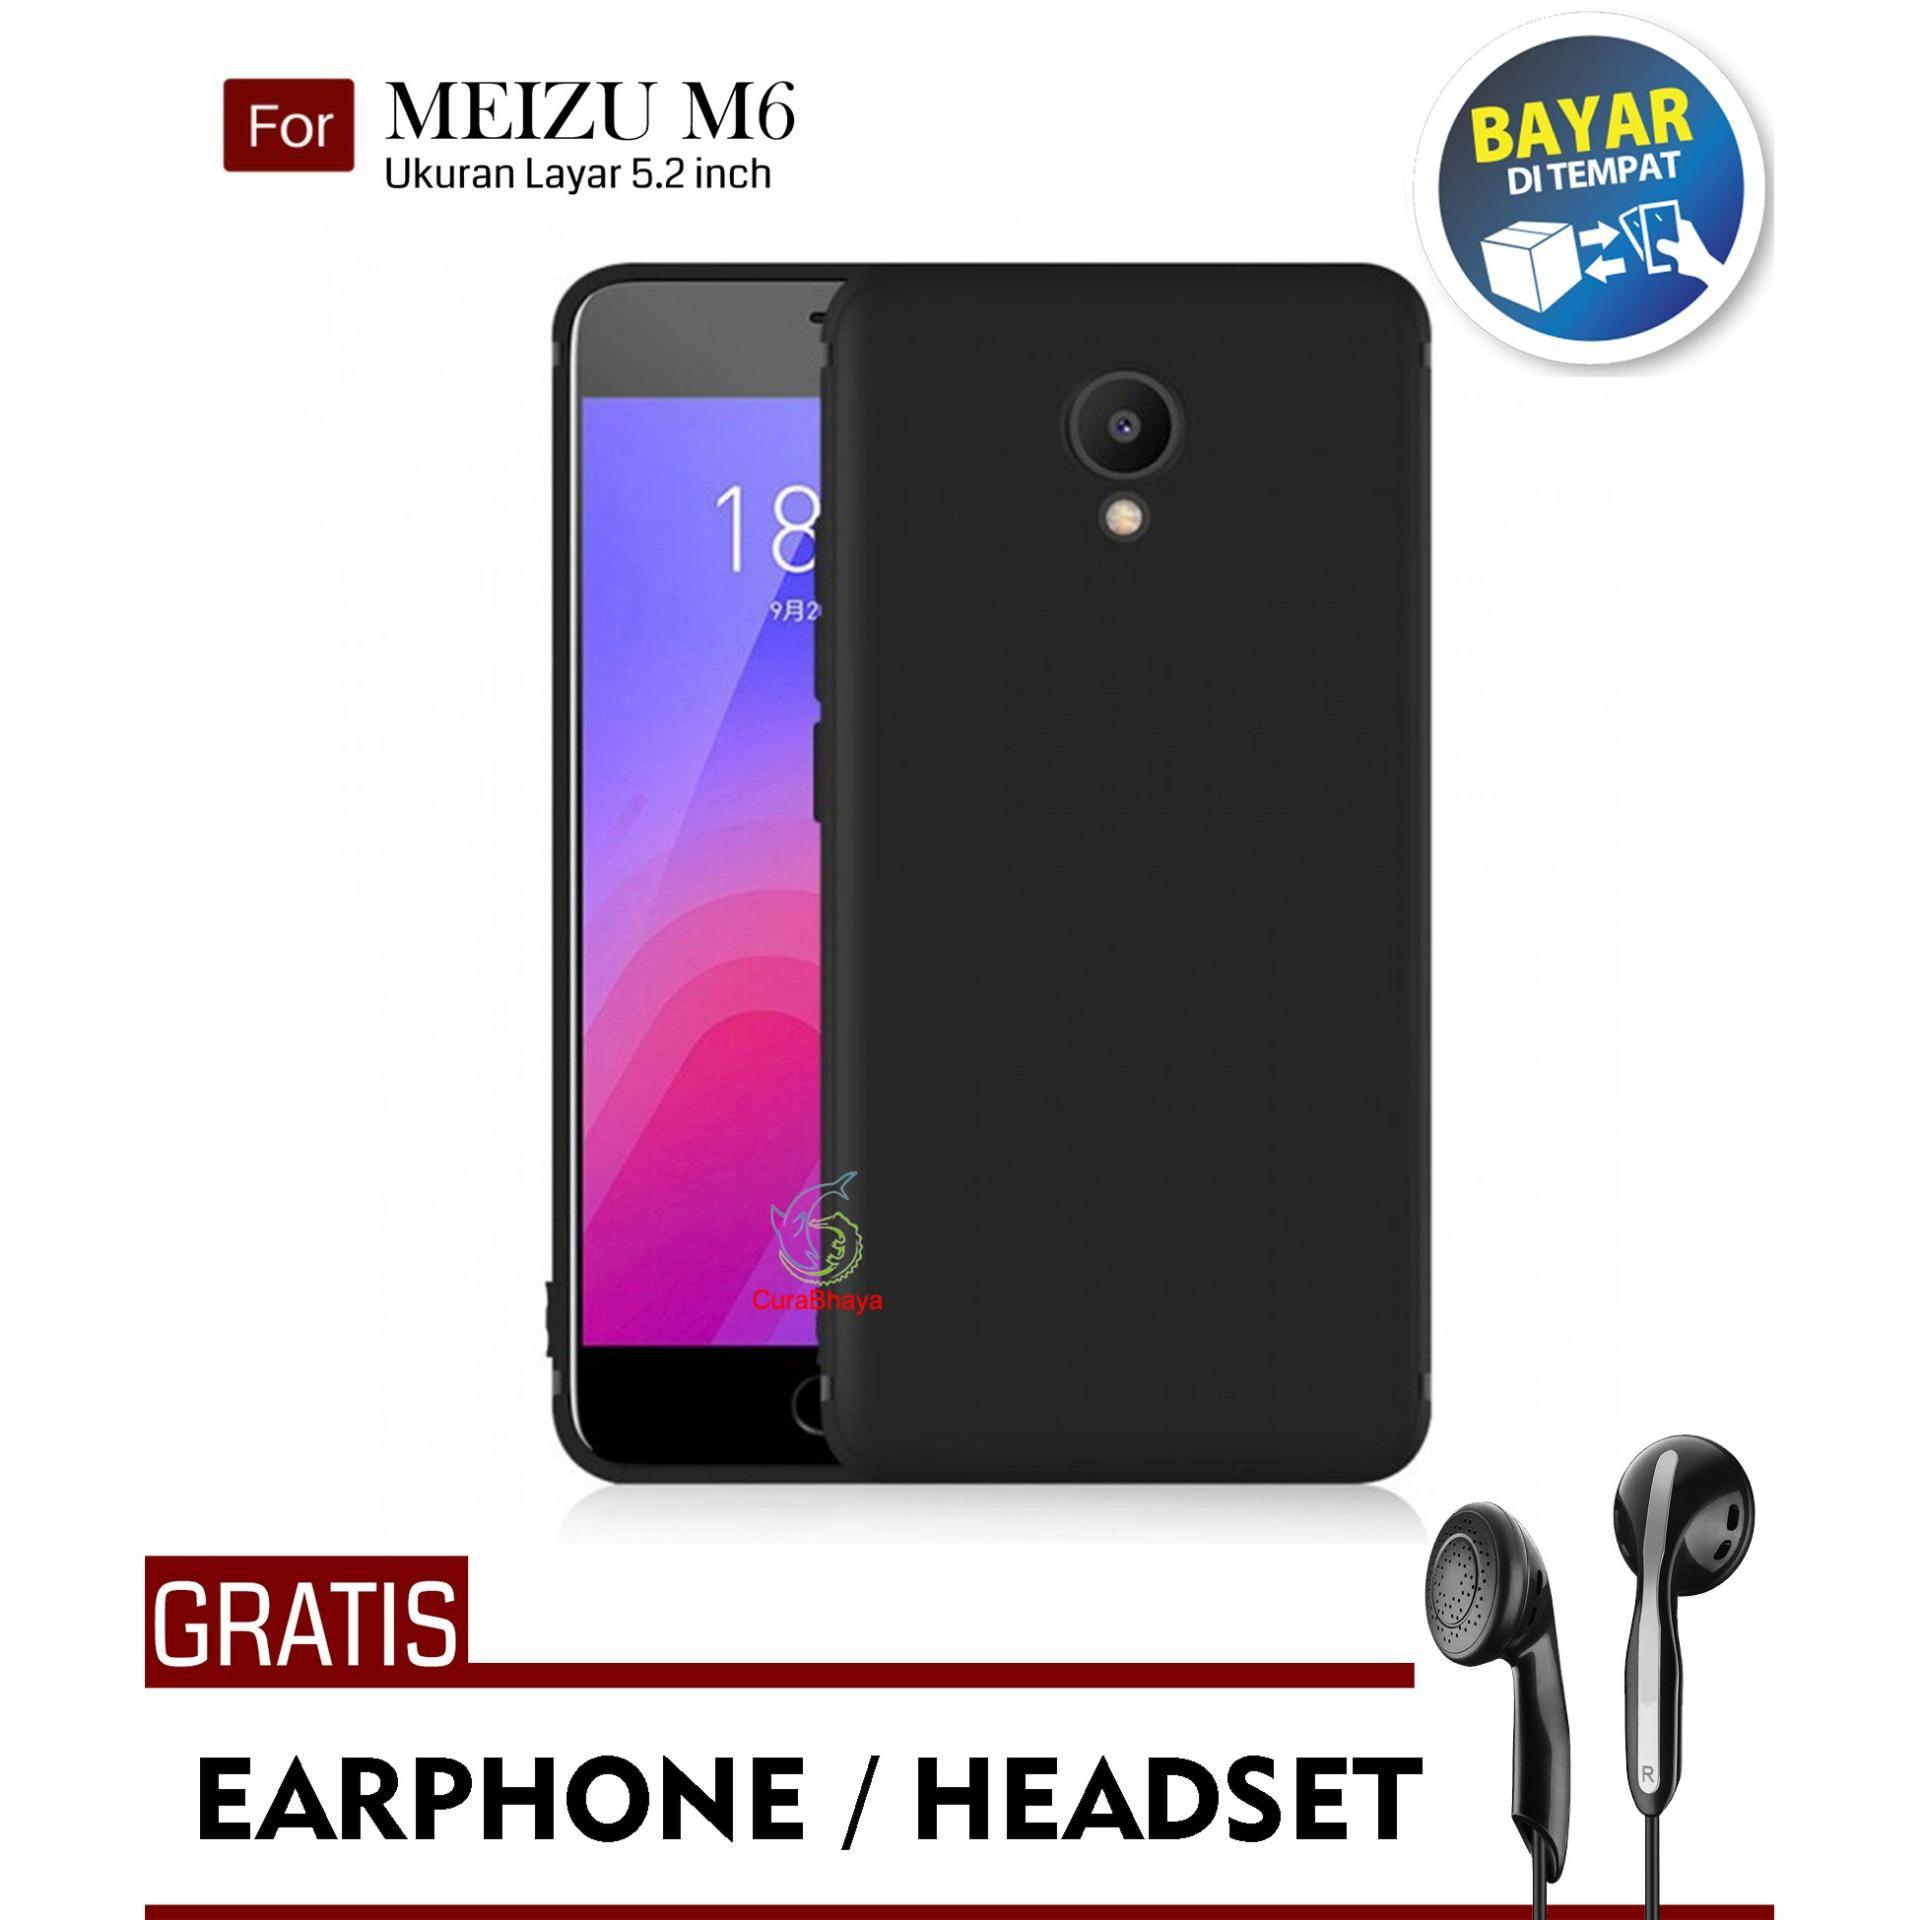 MidNight Meizu M6 | Slim Case Black Matte Softcase Premium Baby Skin + Gratis Free Earphone